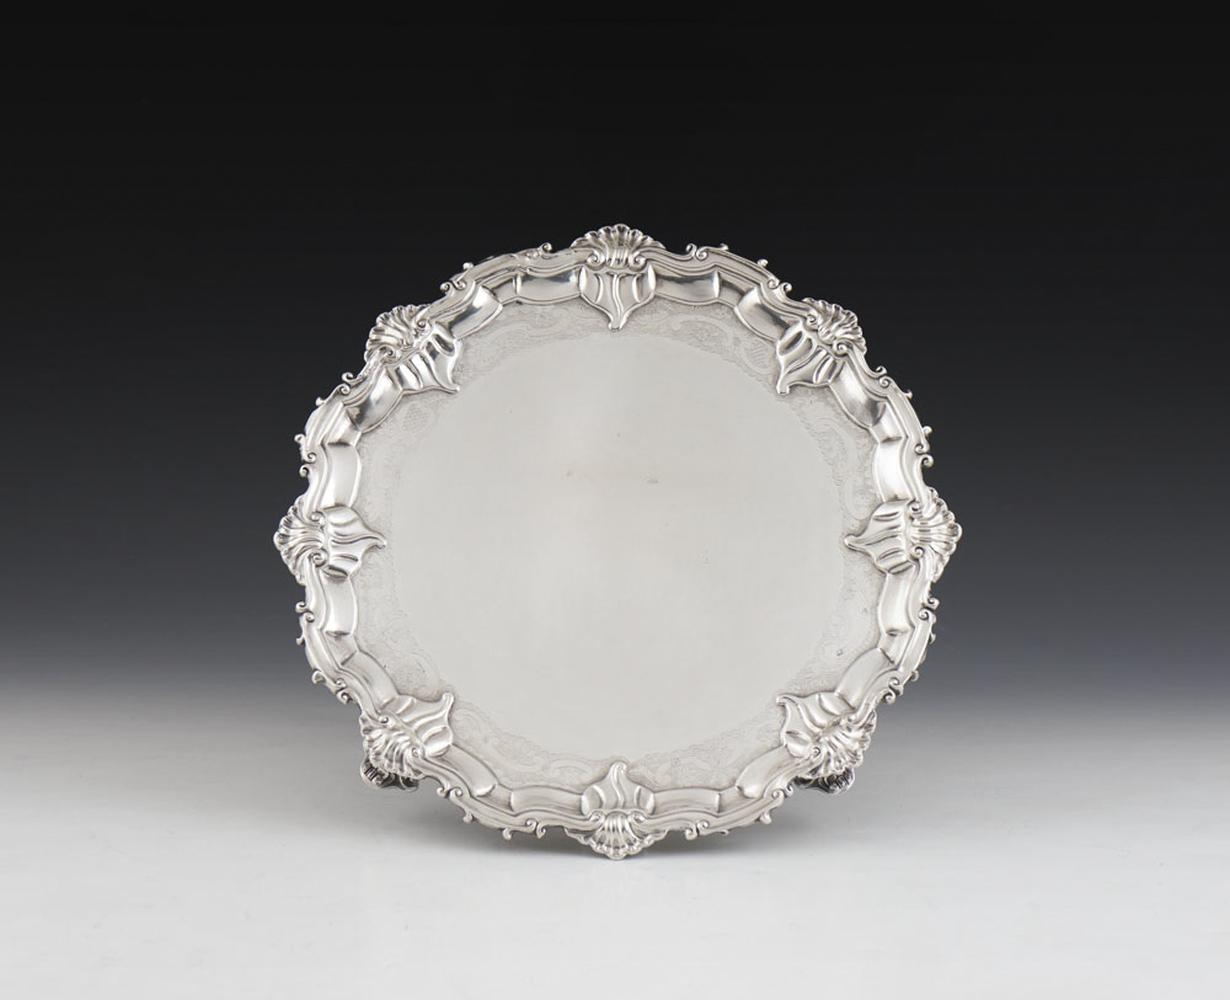 Salva em prata portuguesa, séc. XVIII, P.: 946 g.